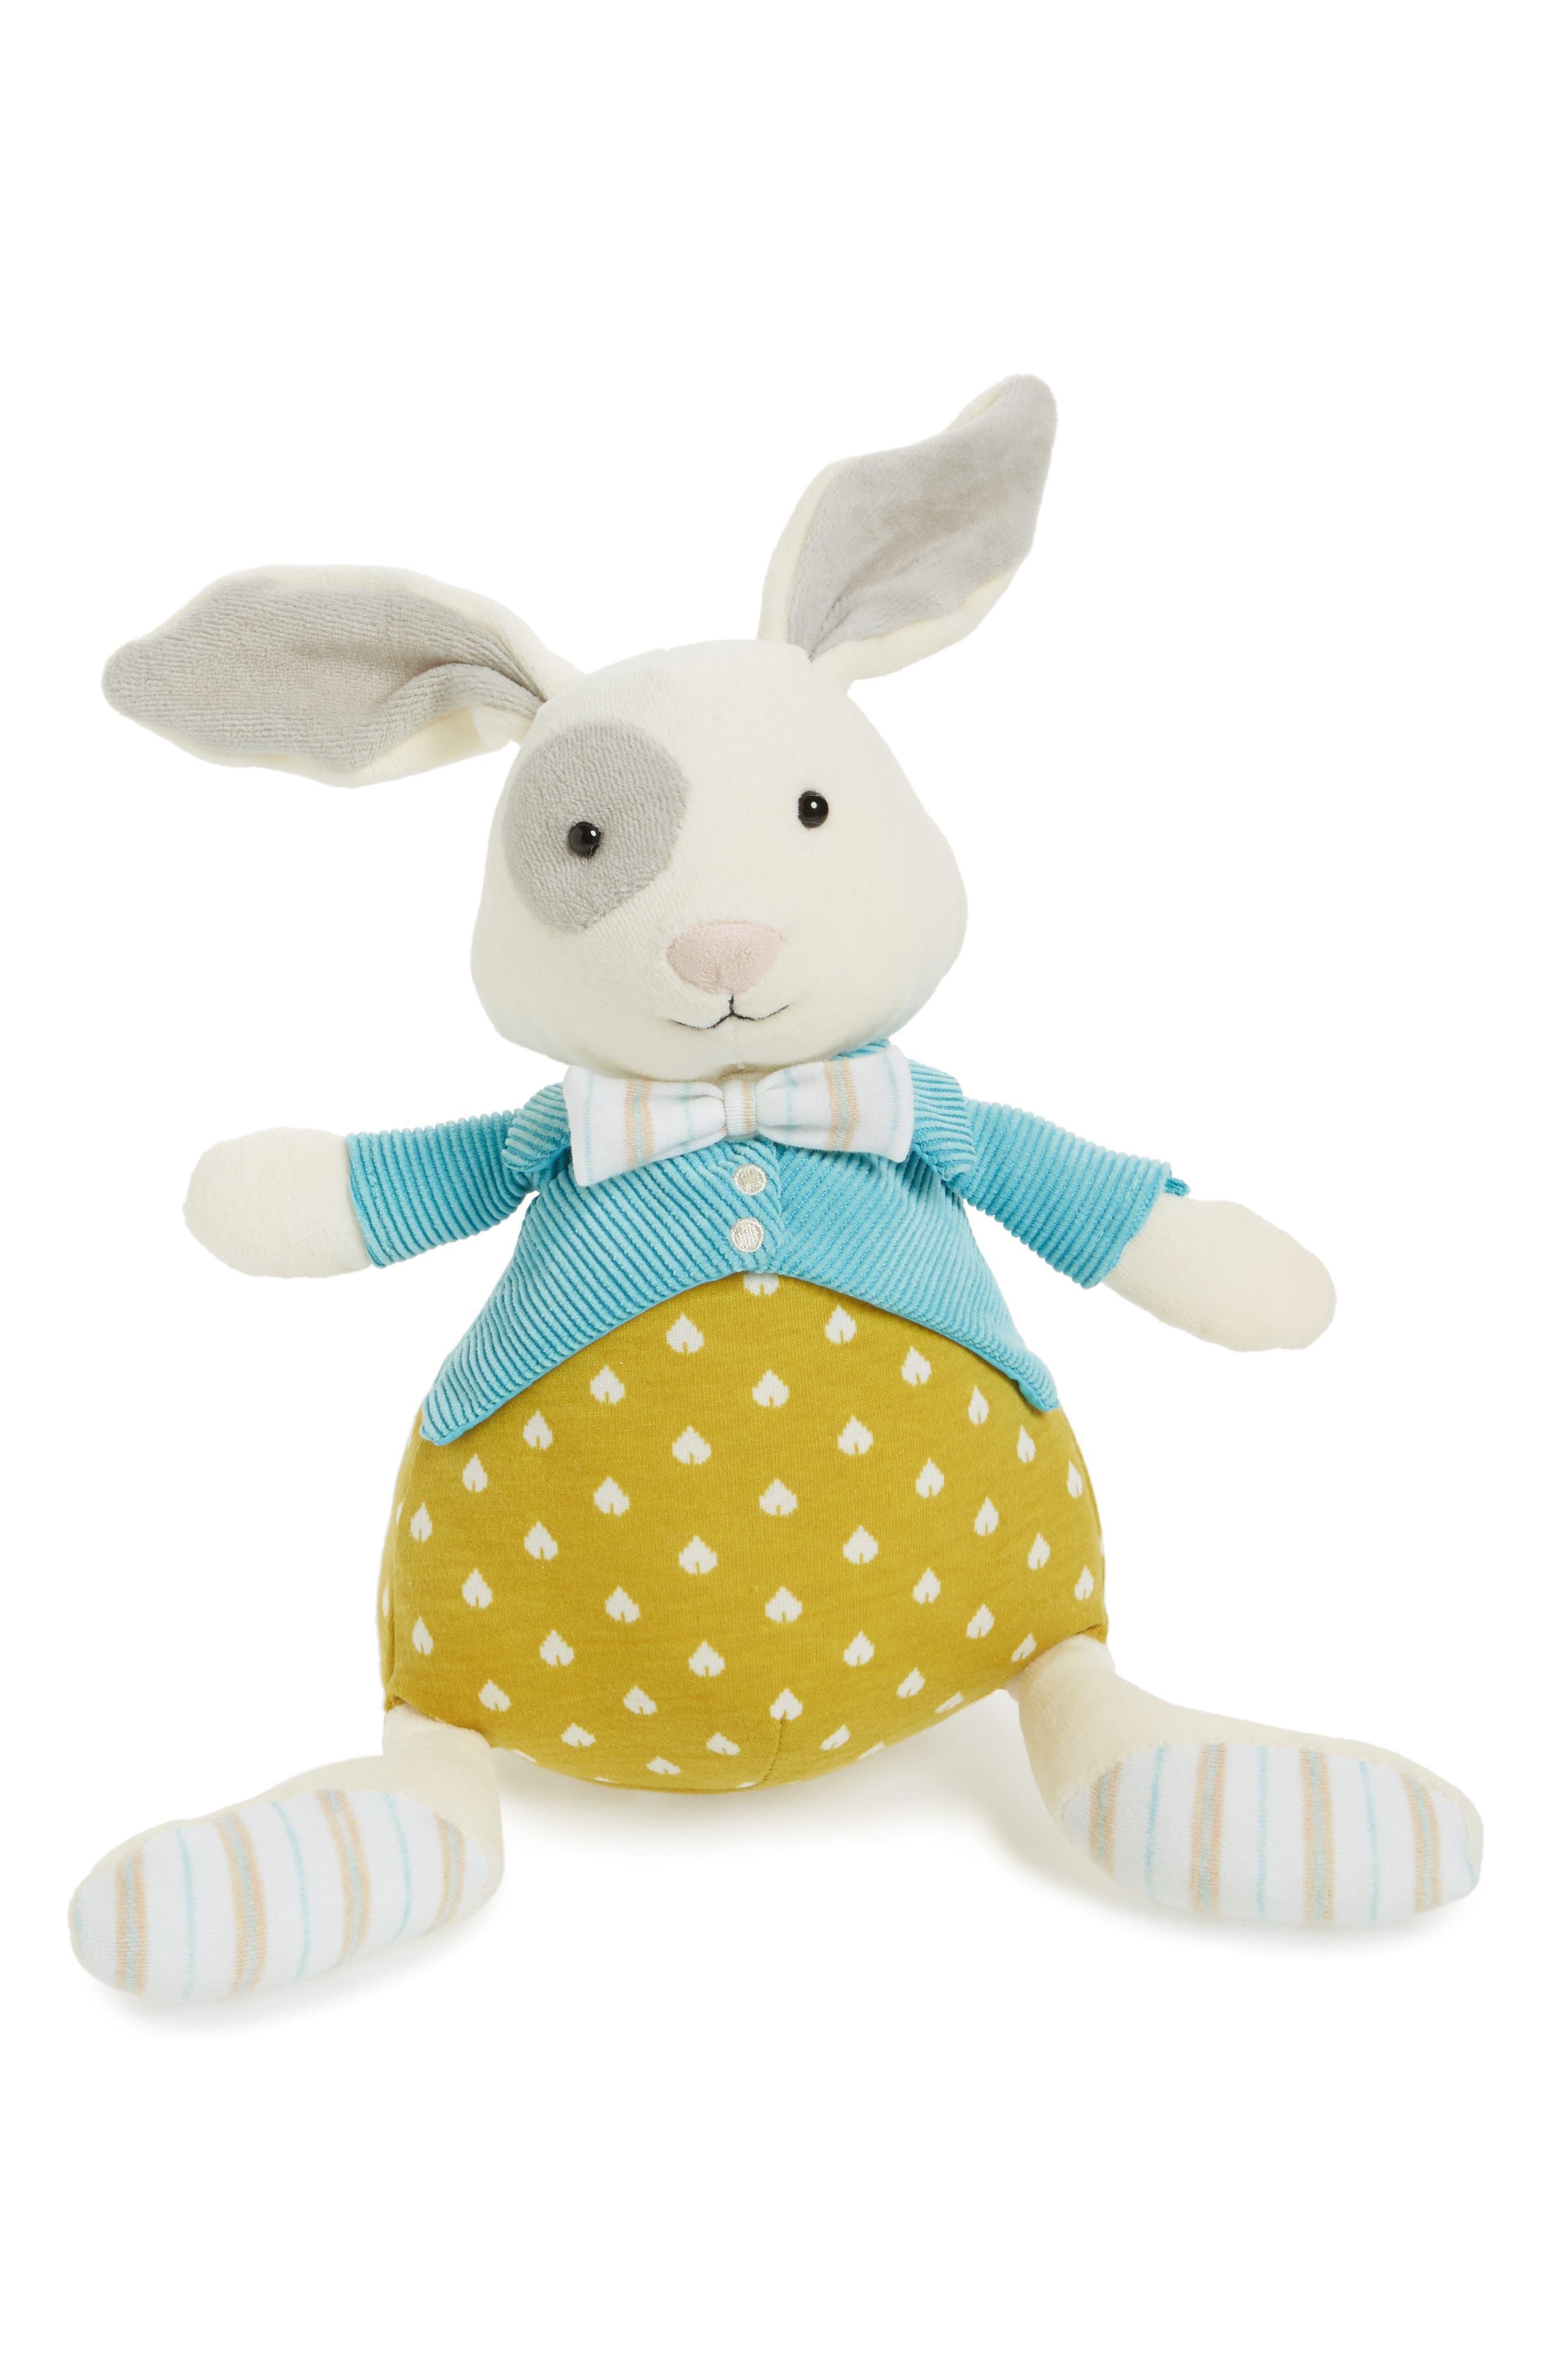 Lewis Rabbit Stuffed Animal,                         Main,                         color, 300